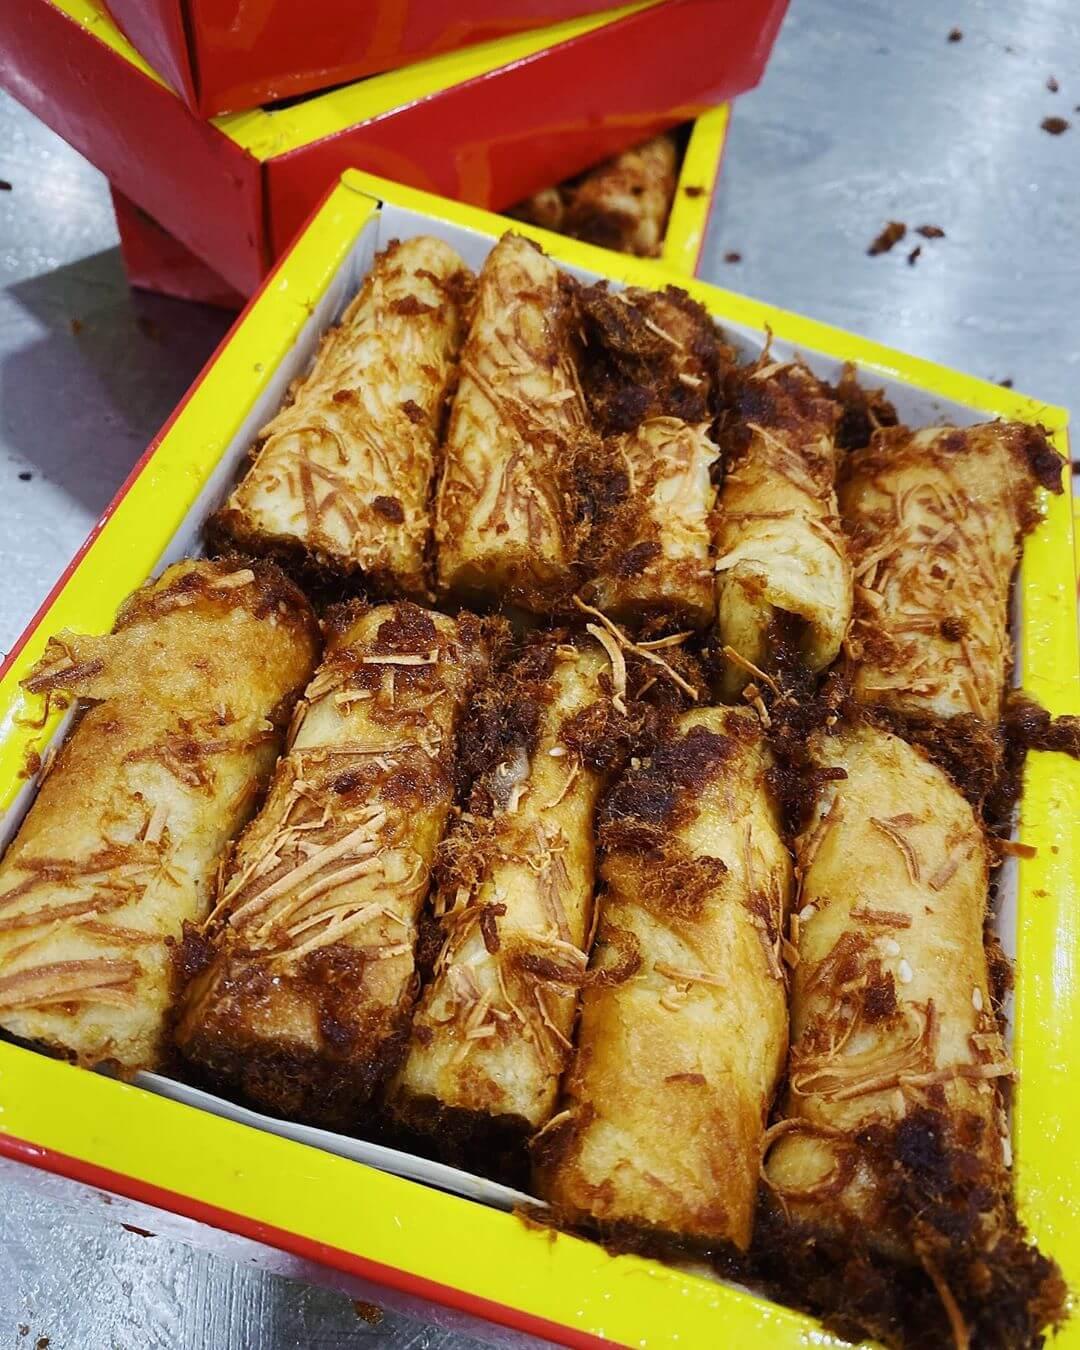 Makanan Khas Papua : makanan, papua, Makanan, Papua, Harga, Rekomendasi, Restonya